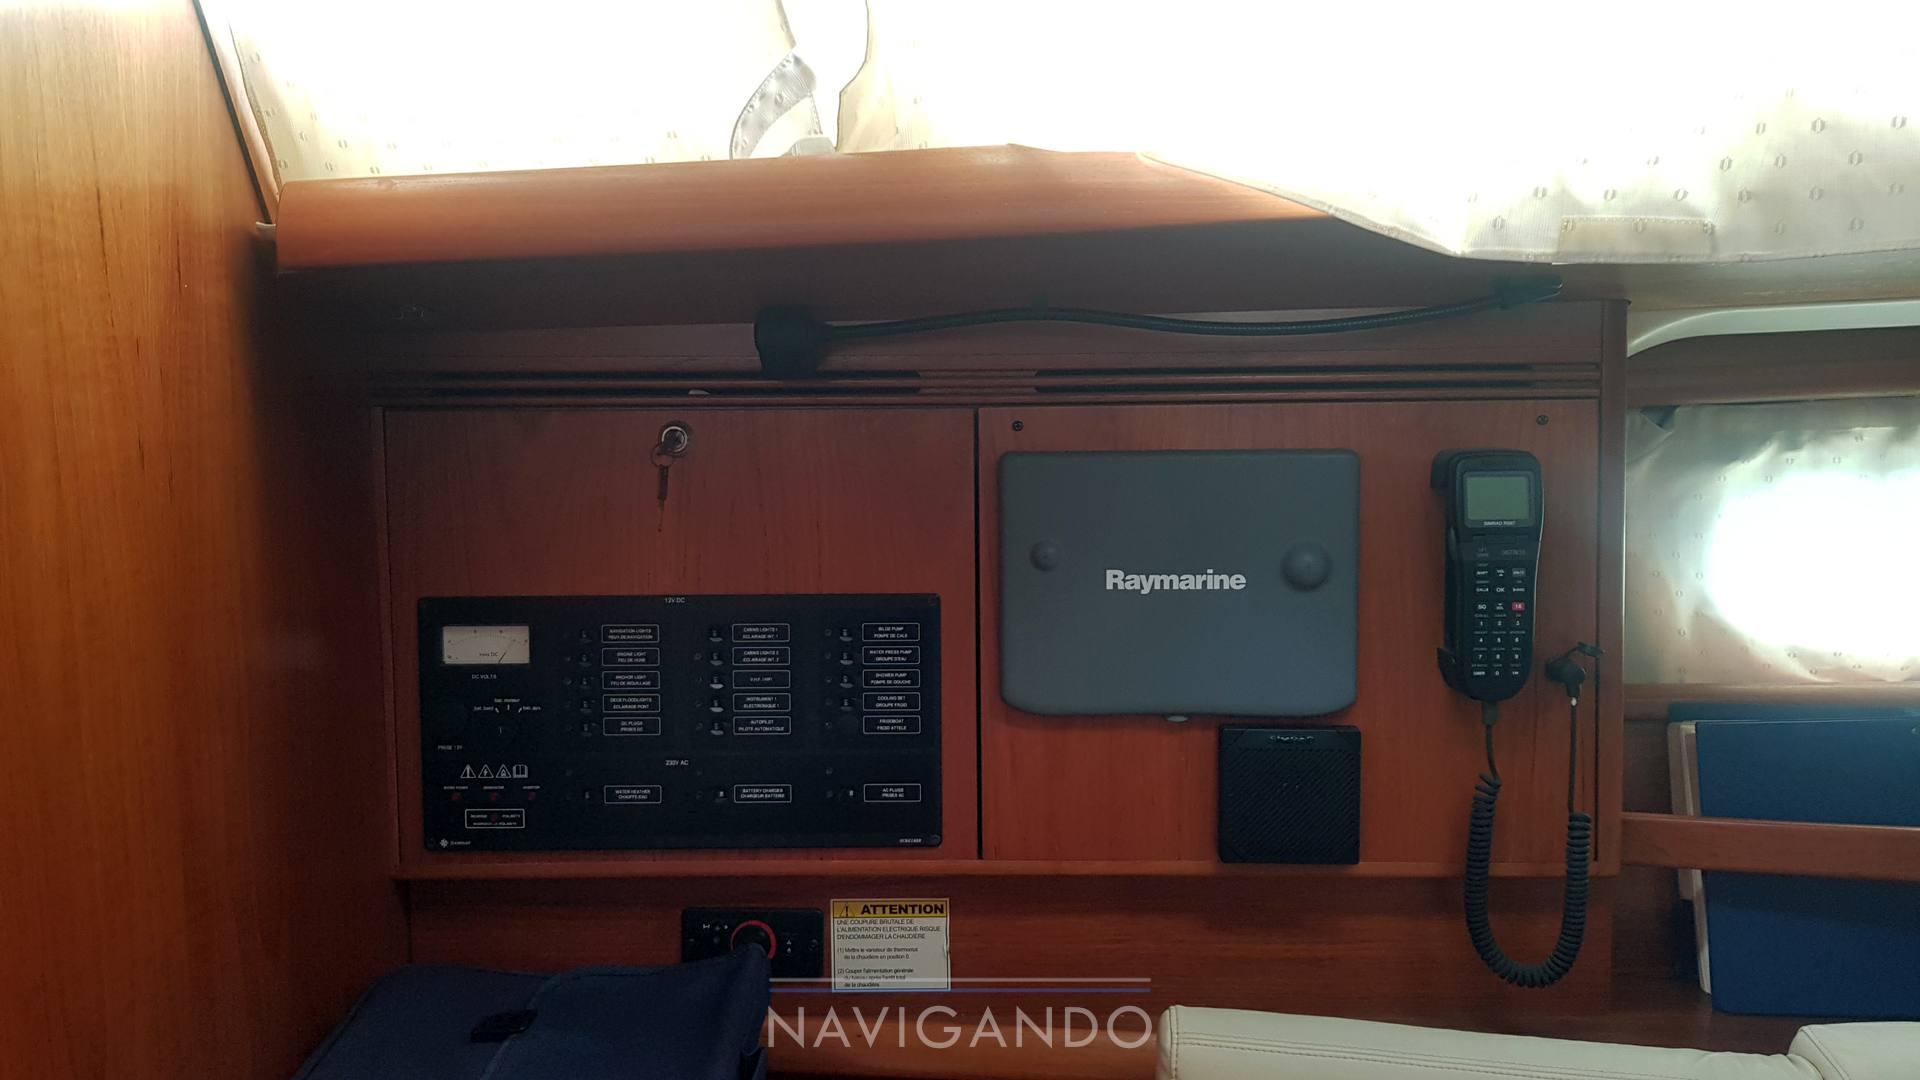 Jeanneau Sun odyssey 40.3 Sailing boat used for sale